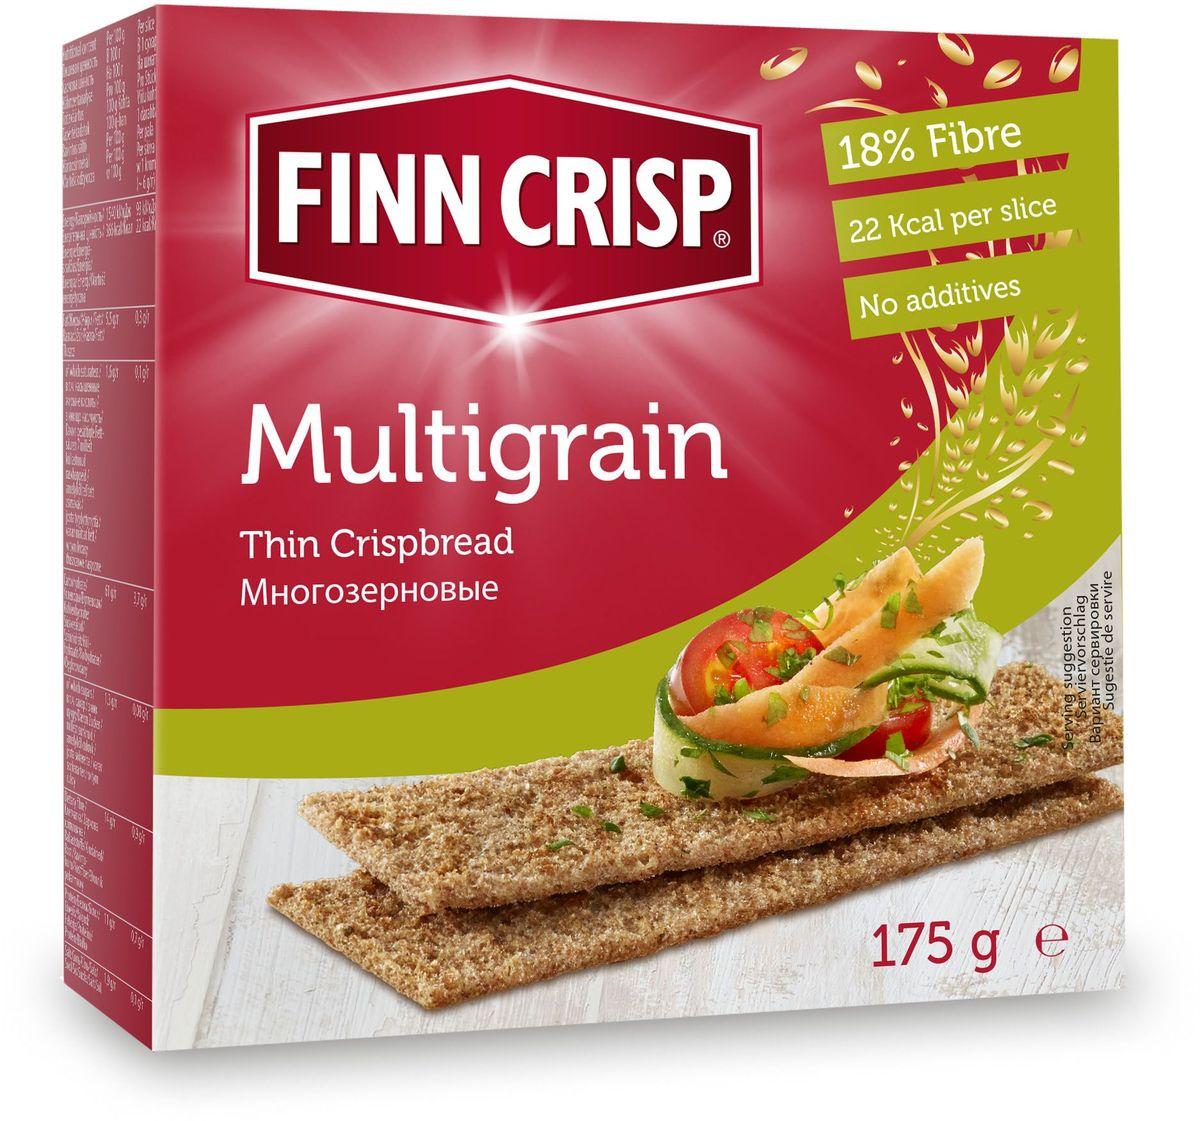 Finn Crisp Multigrain хлебцы многозерновые, 175 г finn crisp traditional хлебцы традиционные 200 г